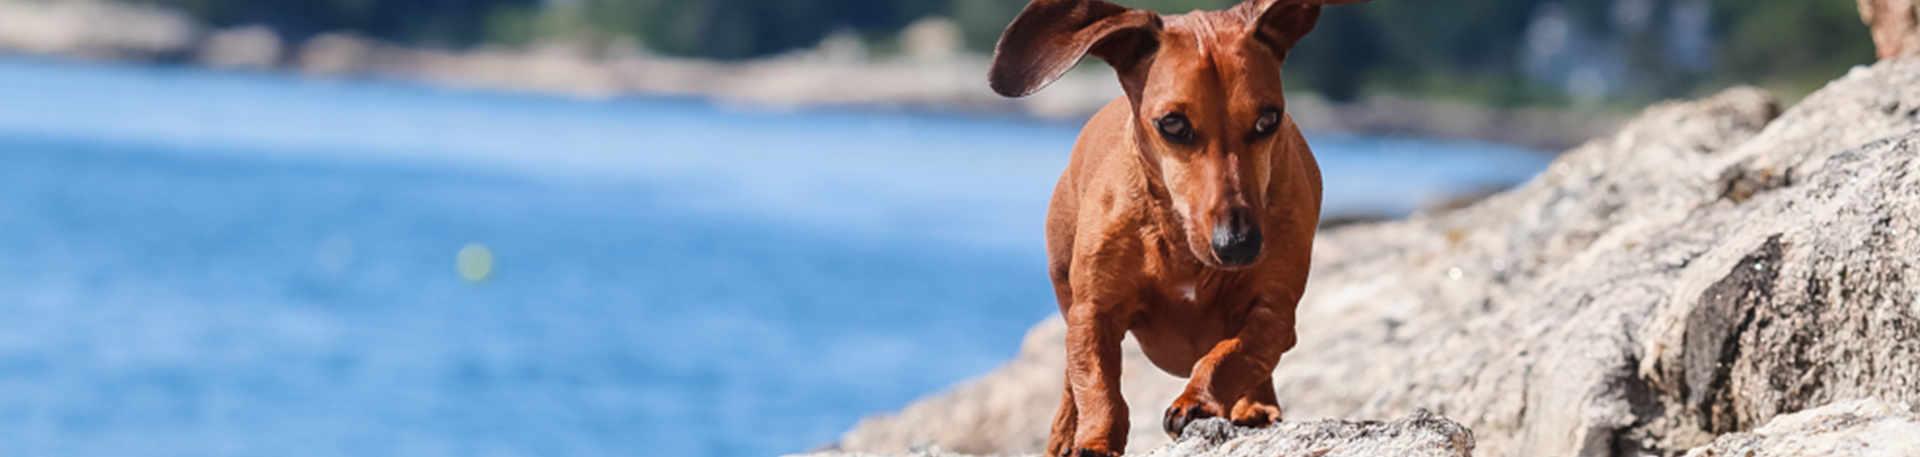 Boothbay-Region-Dog-Friendly-Resources-new